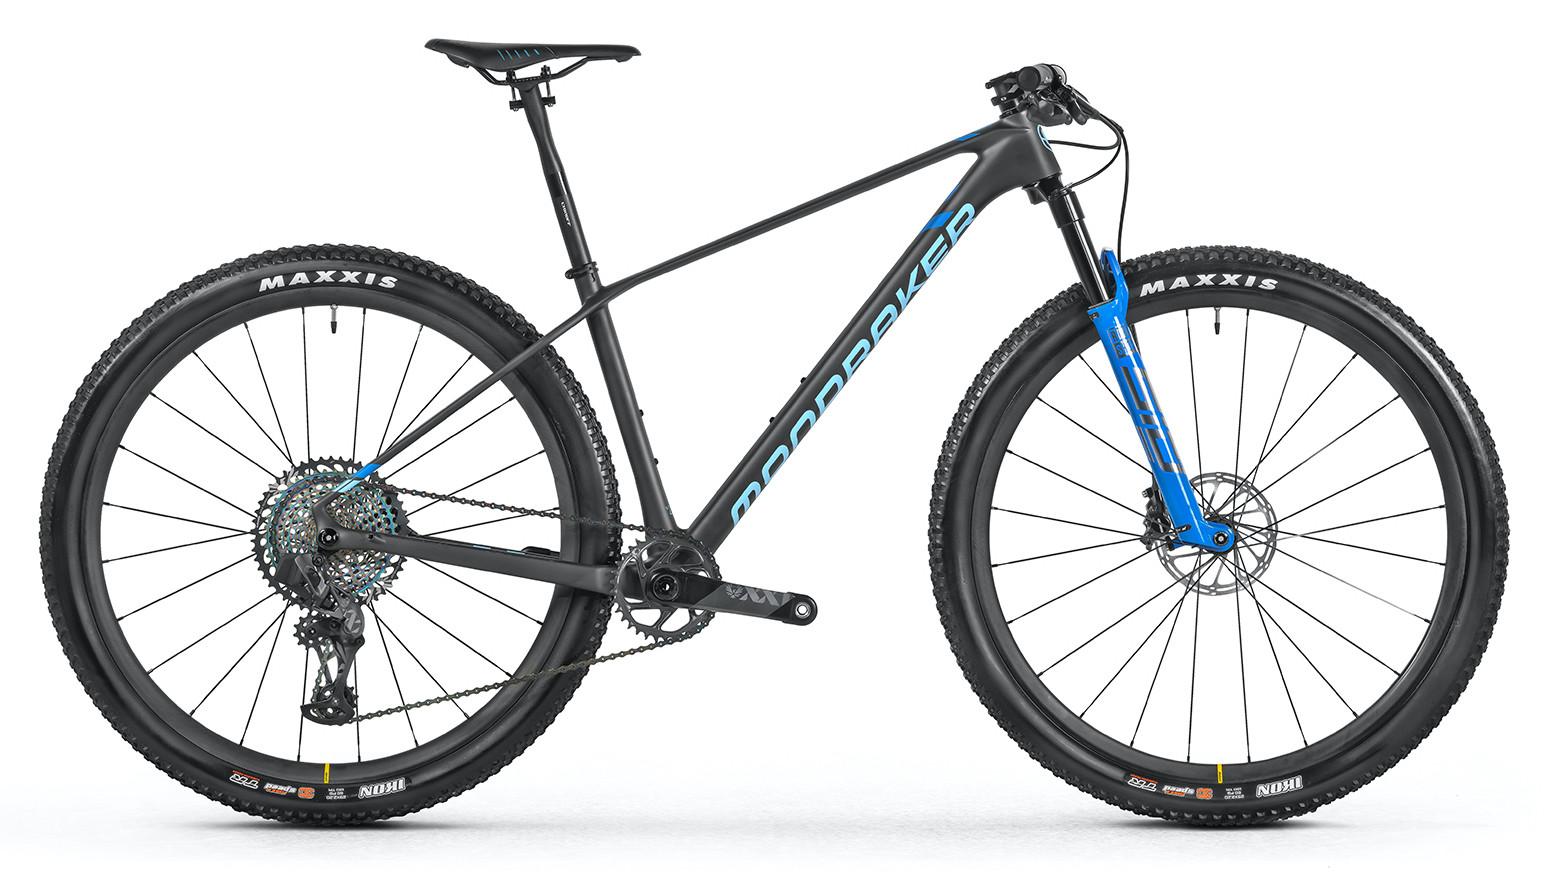 Lightest Production MTB Frameset - Mondraker's New 2021 Podium Carbon XC Race Bike